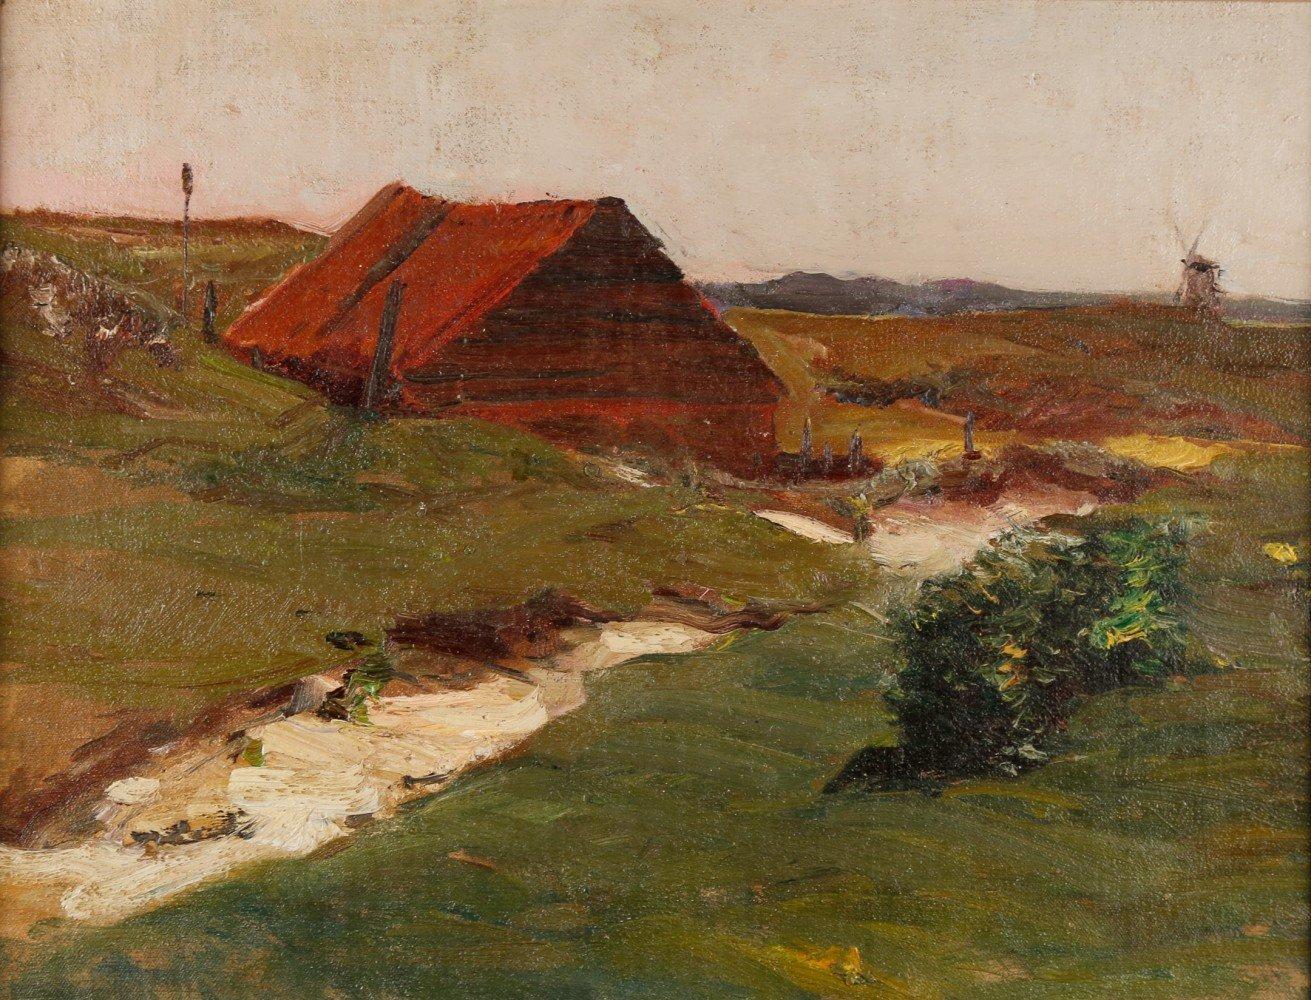 Near Maassluis by Henry George Keller